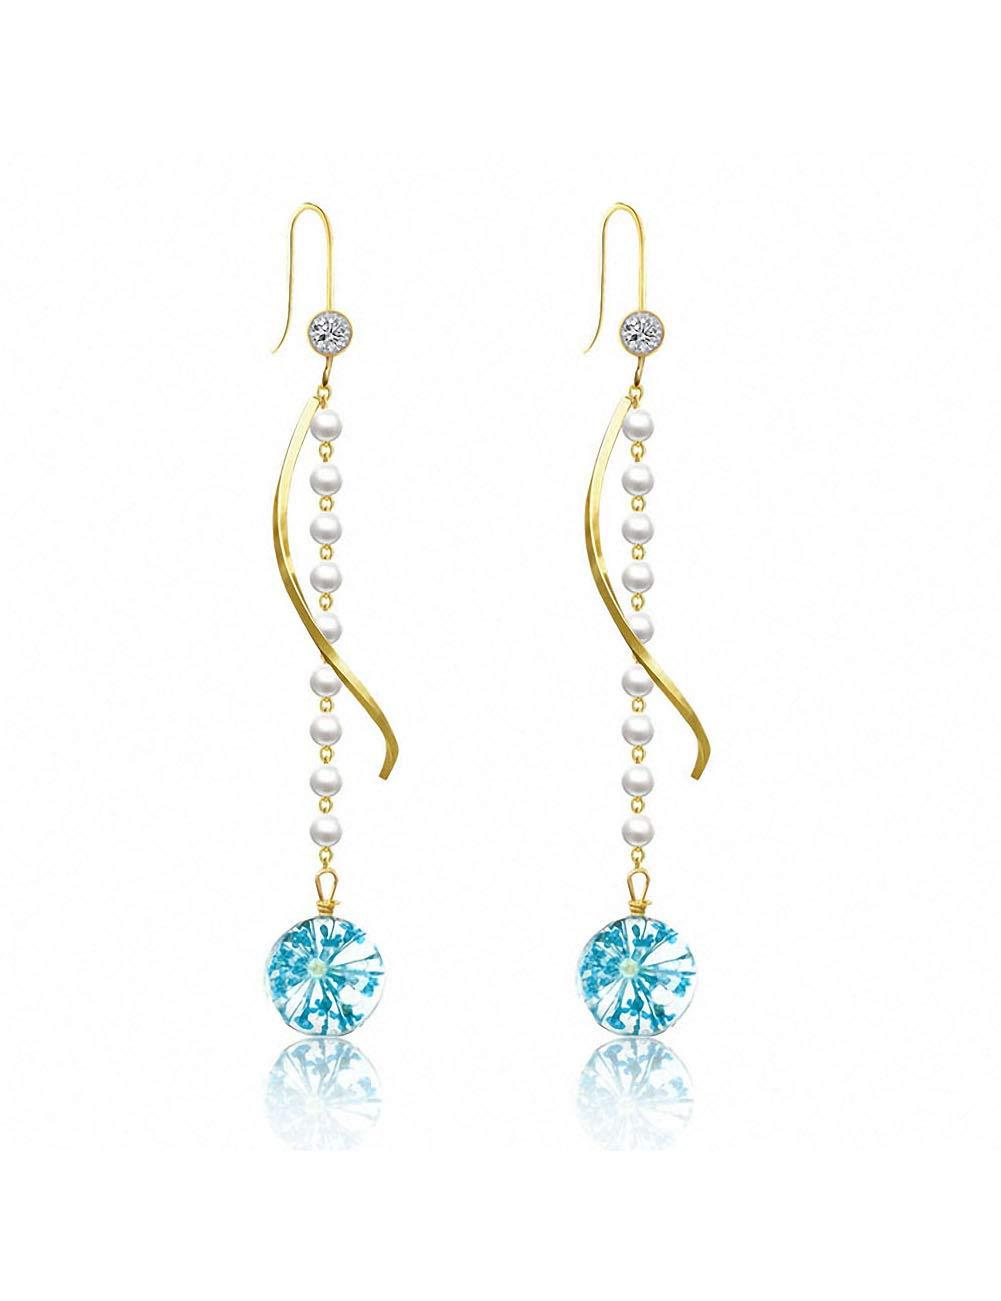 Syshion Gold Plated Earring 2.75 In Ear pendant Eardrop Long Tassel Wave Cuff for Women Girls with Glass Immortalized Flower Blue